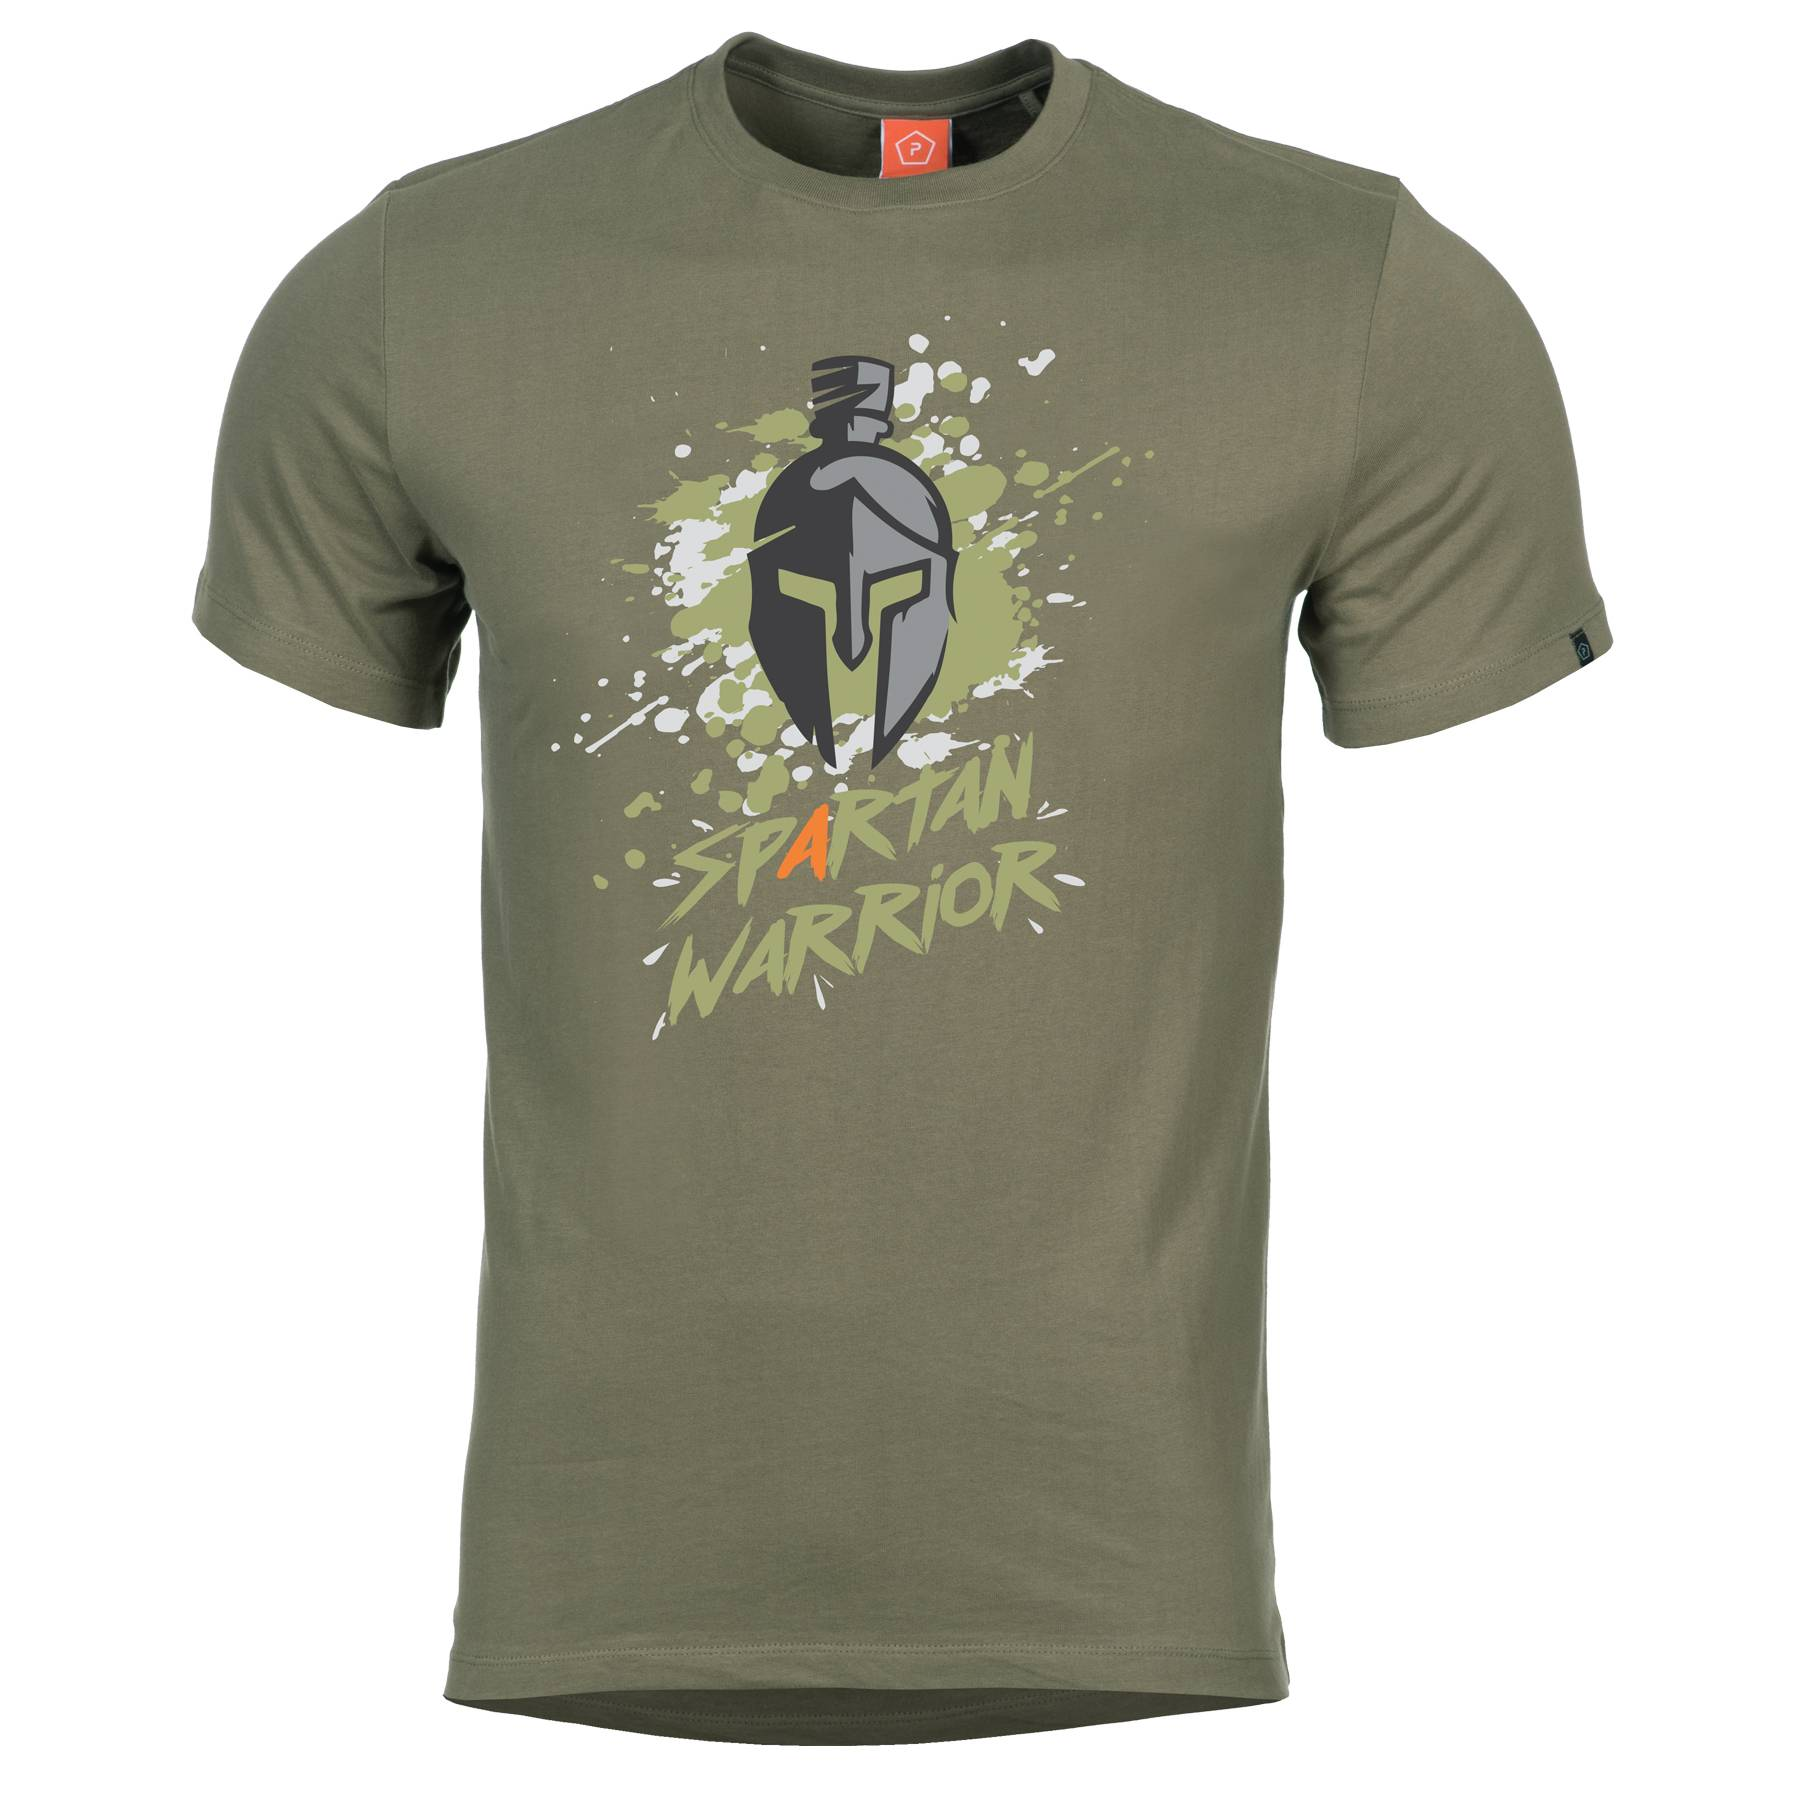 839b241a7 Pentagon Spartan Warrior tričko Olivové - HORAL shop